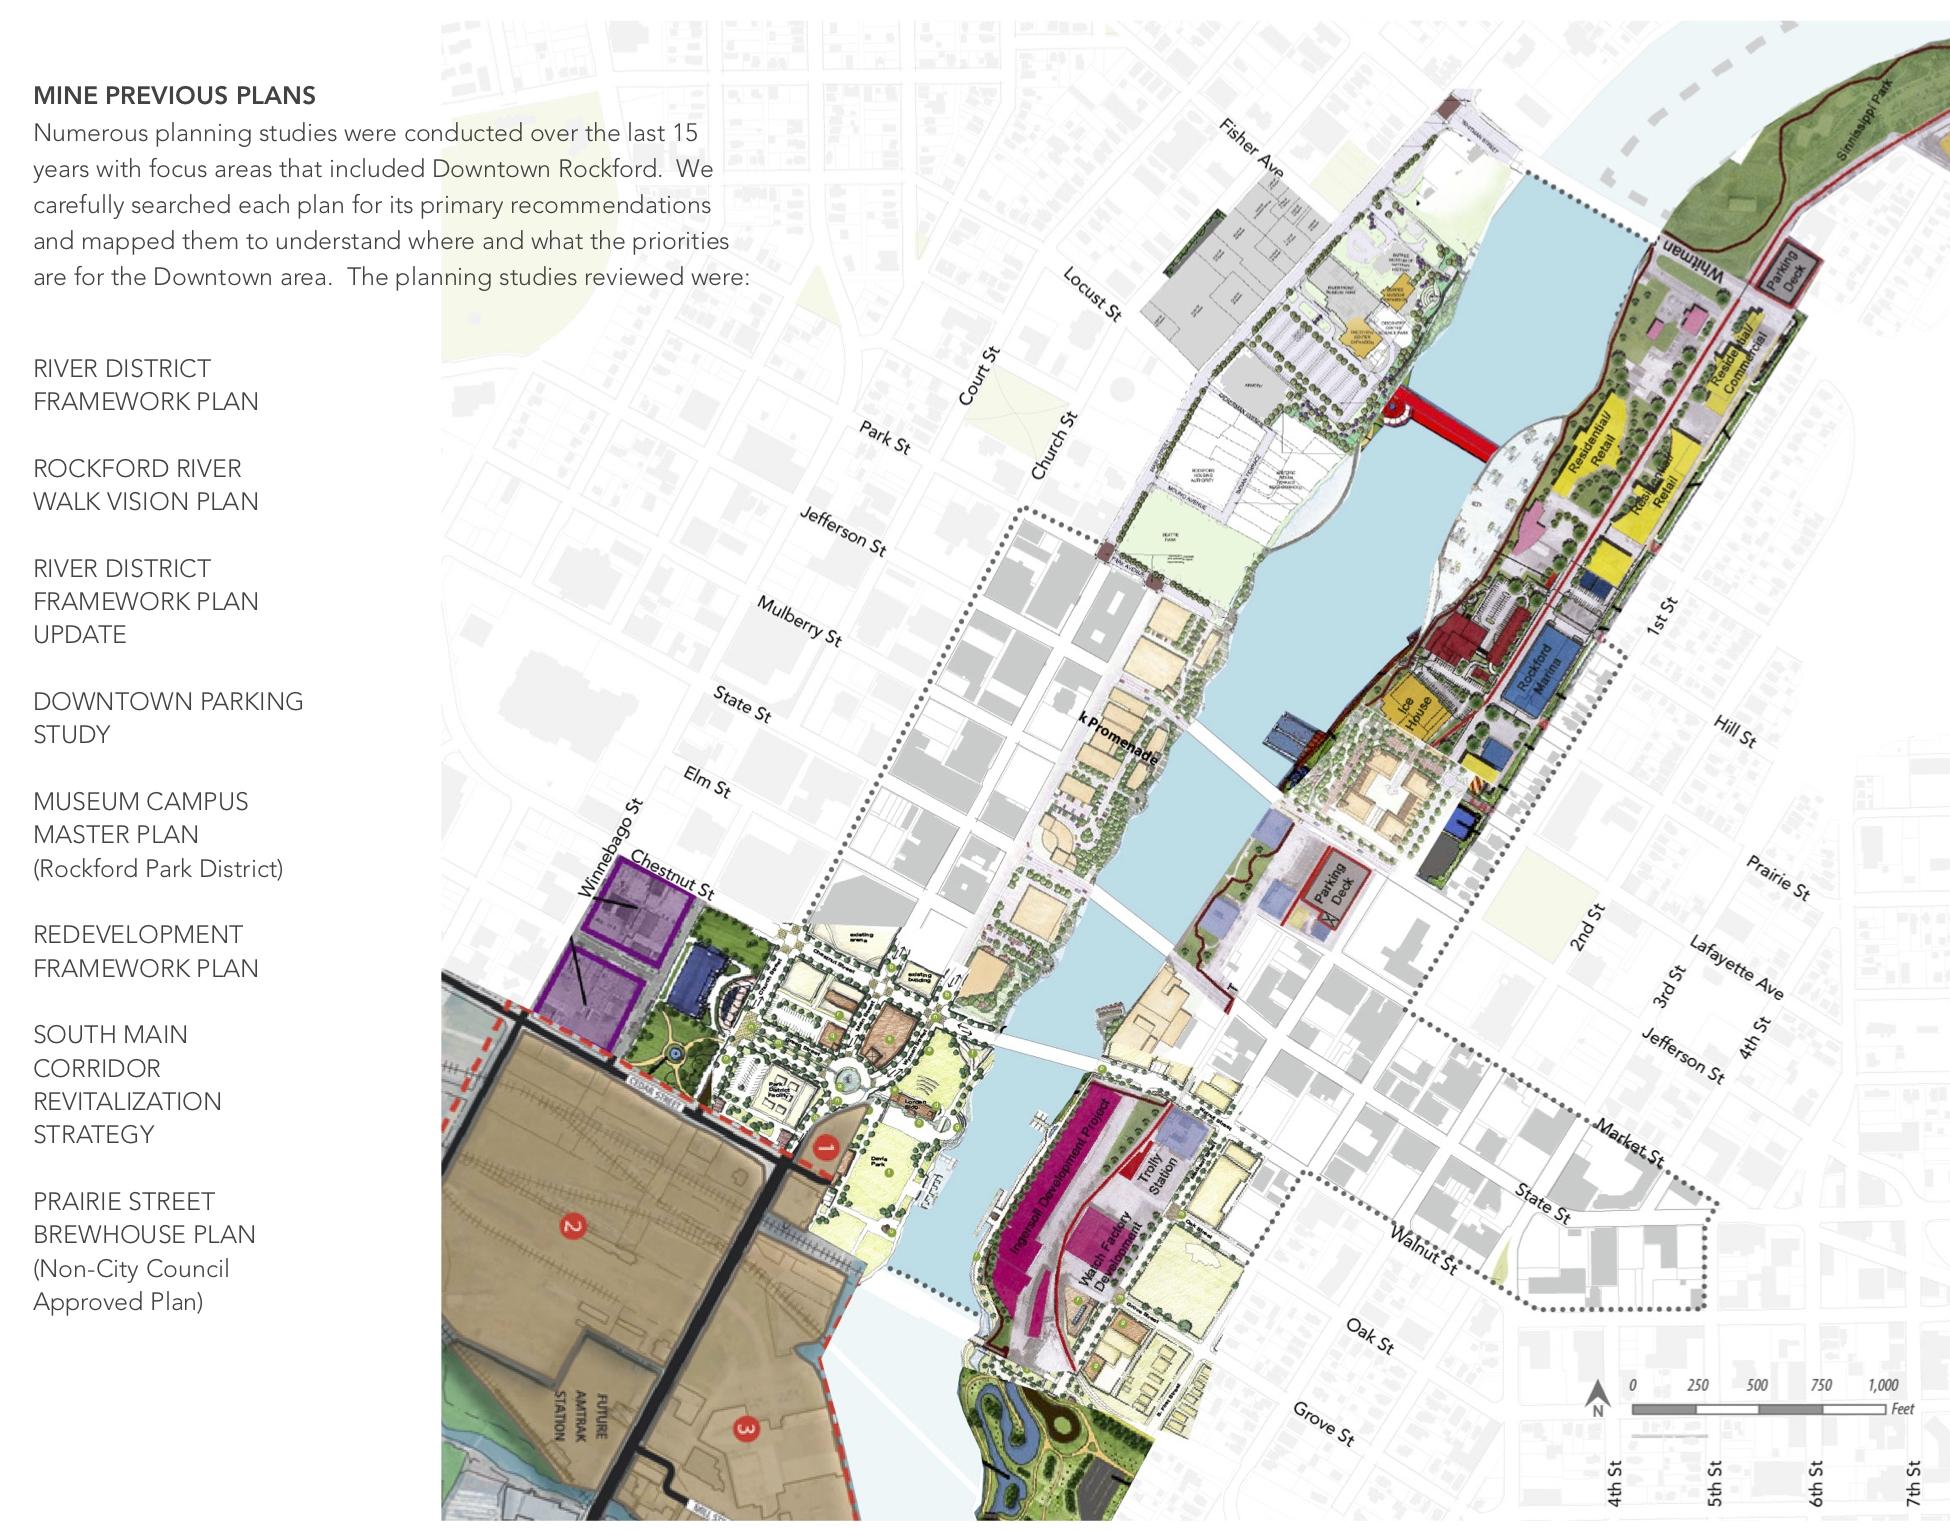 Rockford-previousplans.jpg